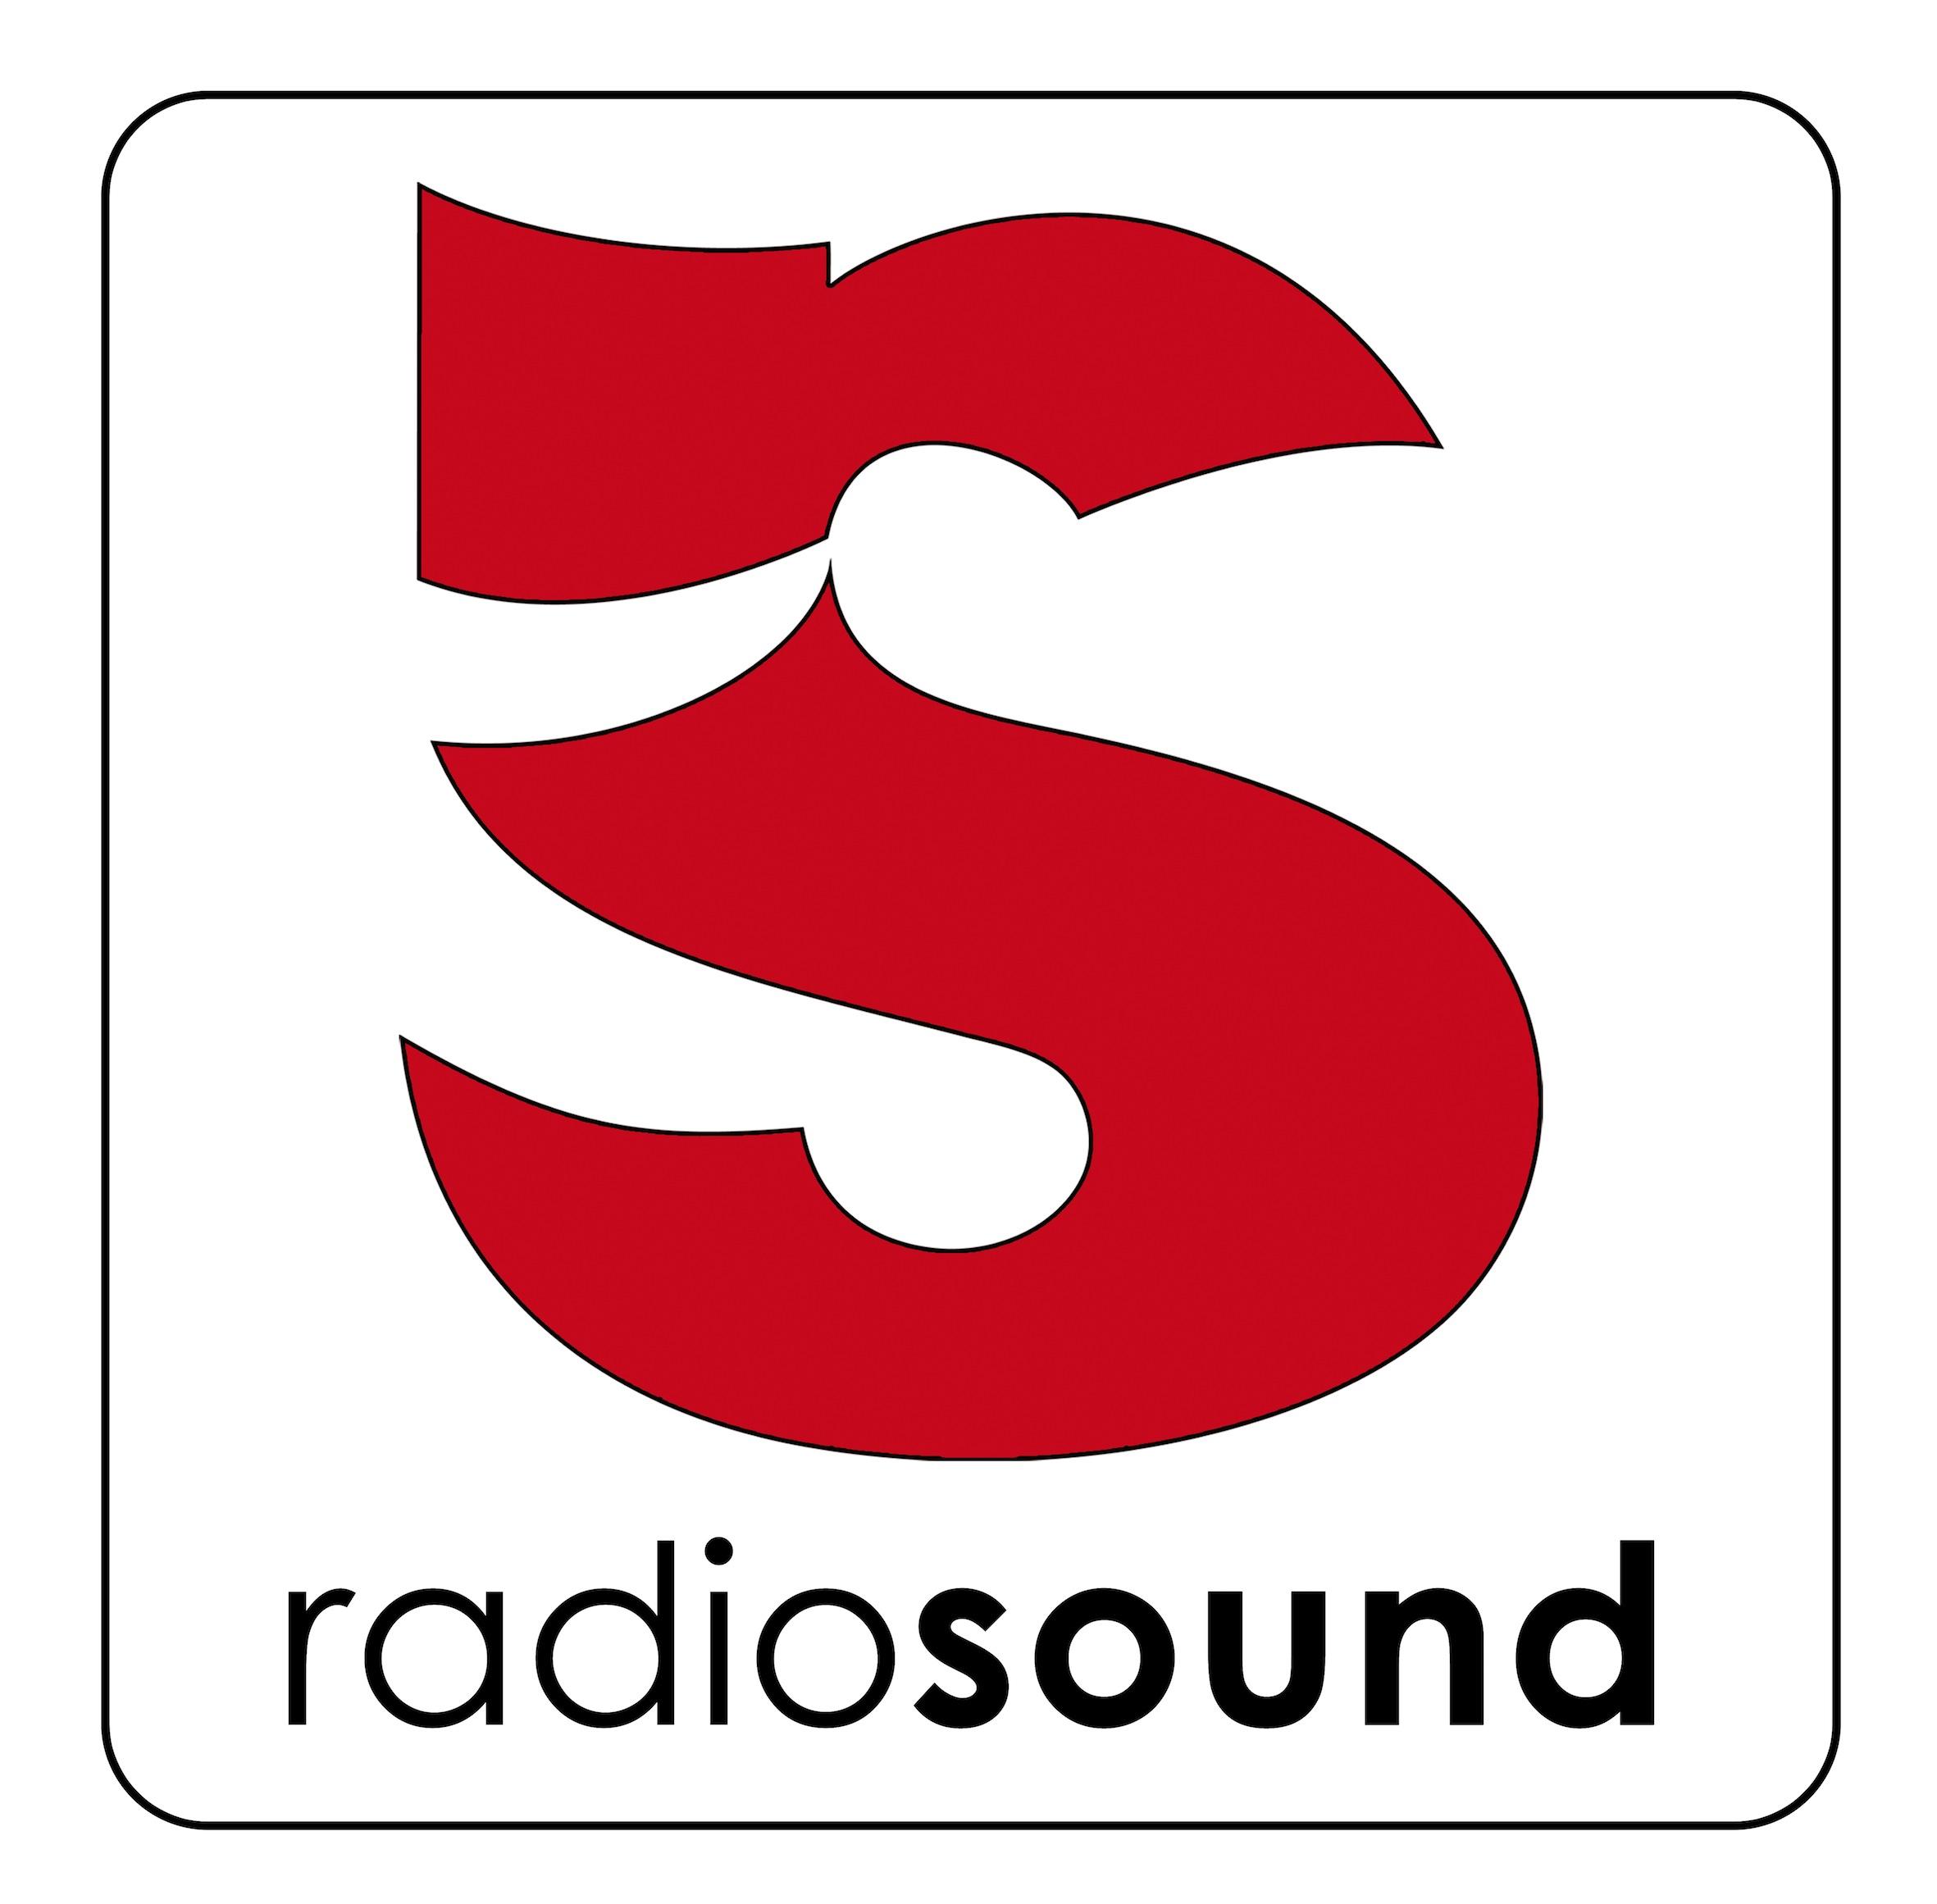 Radiosound